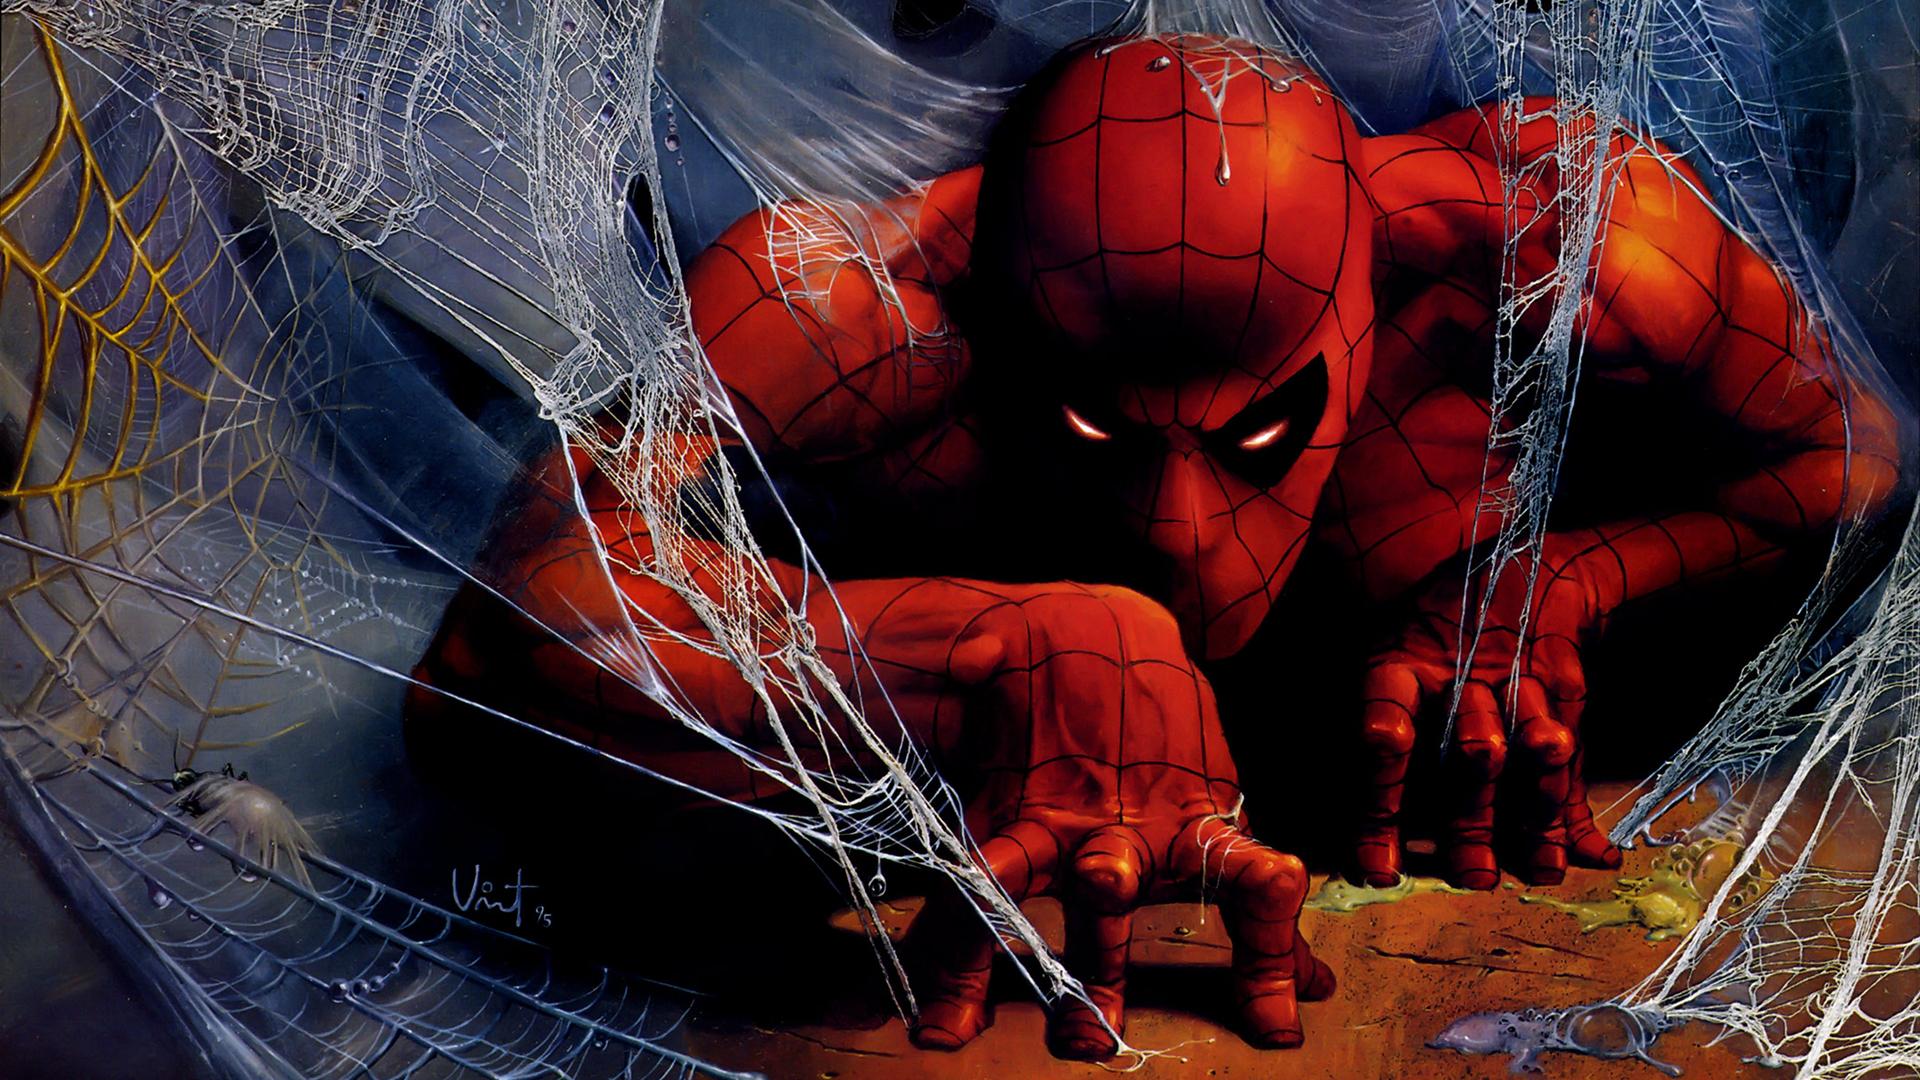 Wallpaper spider man spiderman web art 1920x1080 - Images spiderman ...